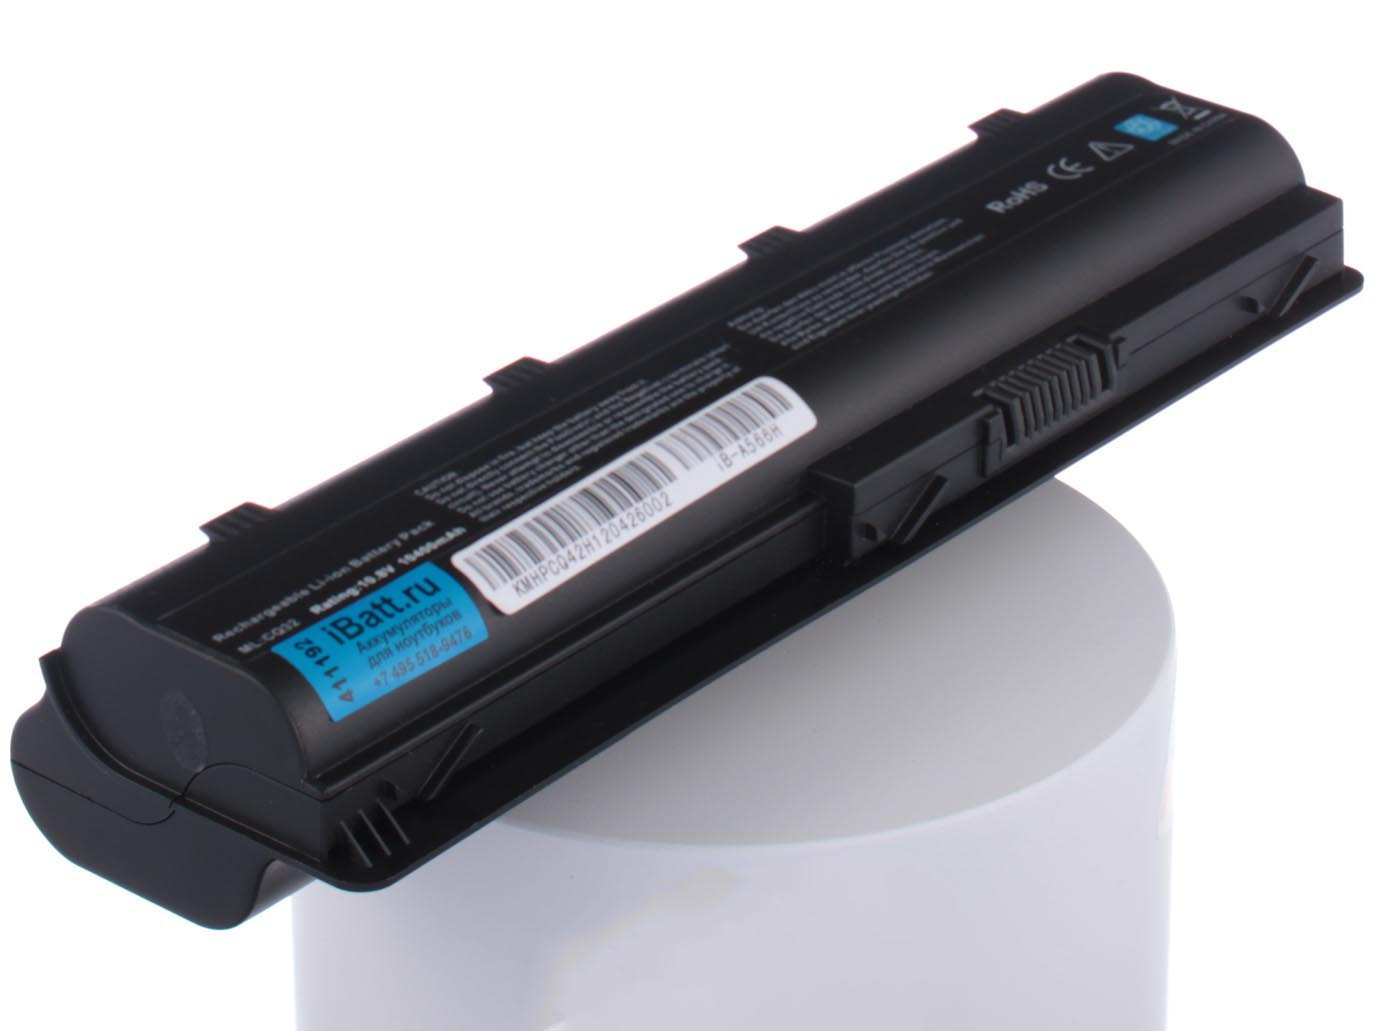 Аккумулятор для ноутбука iBatt для HP-Compaq Pavilion dv7-6b52er, Pavilion dv7-6b54er, Pavilion g6-2205sr, Pavilion g6-1259er, Pavilion g6-1124er, 2000-2d52SR, Pavilion g6-1109er, Pavilion g7-2256sr, G62-a82ER